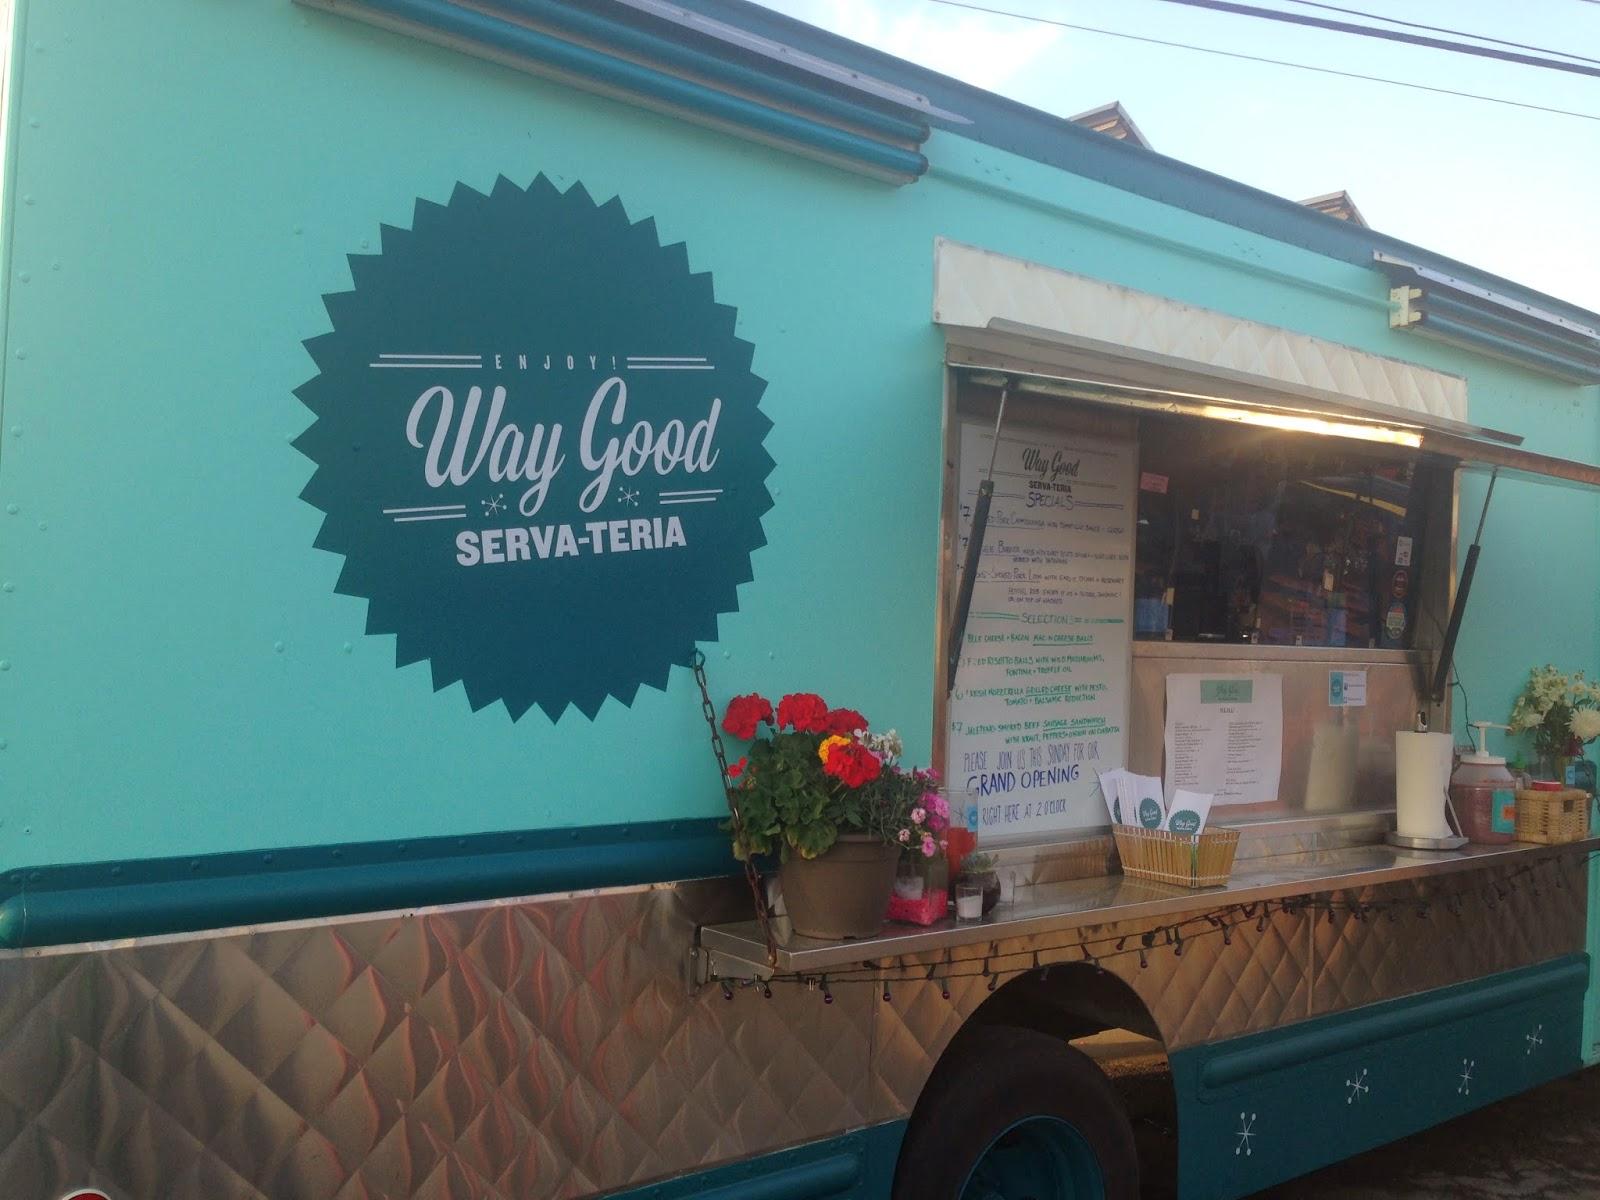 Way Good Serva-Teria Food Truck, Houston TX